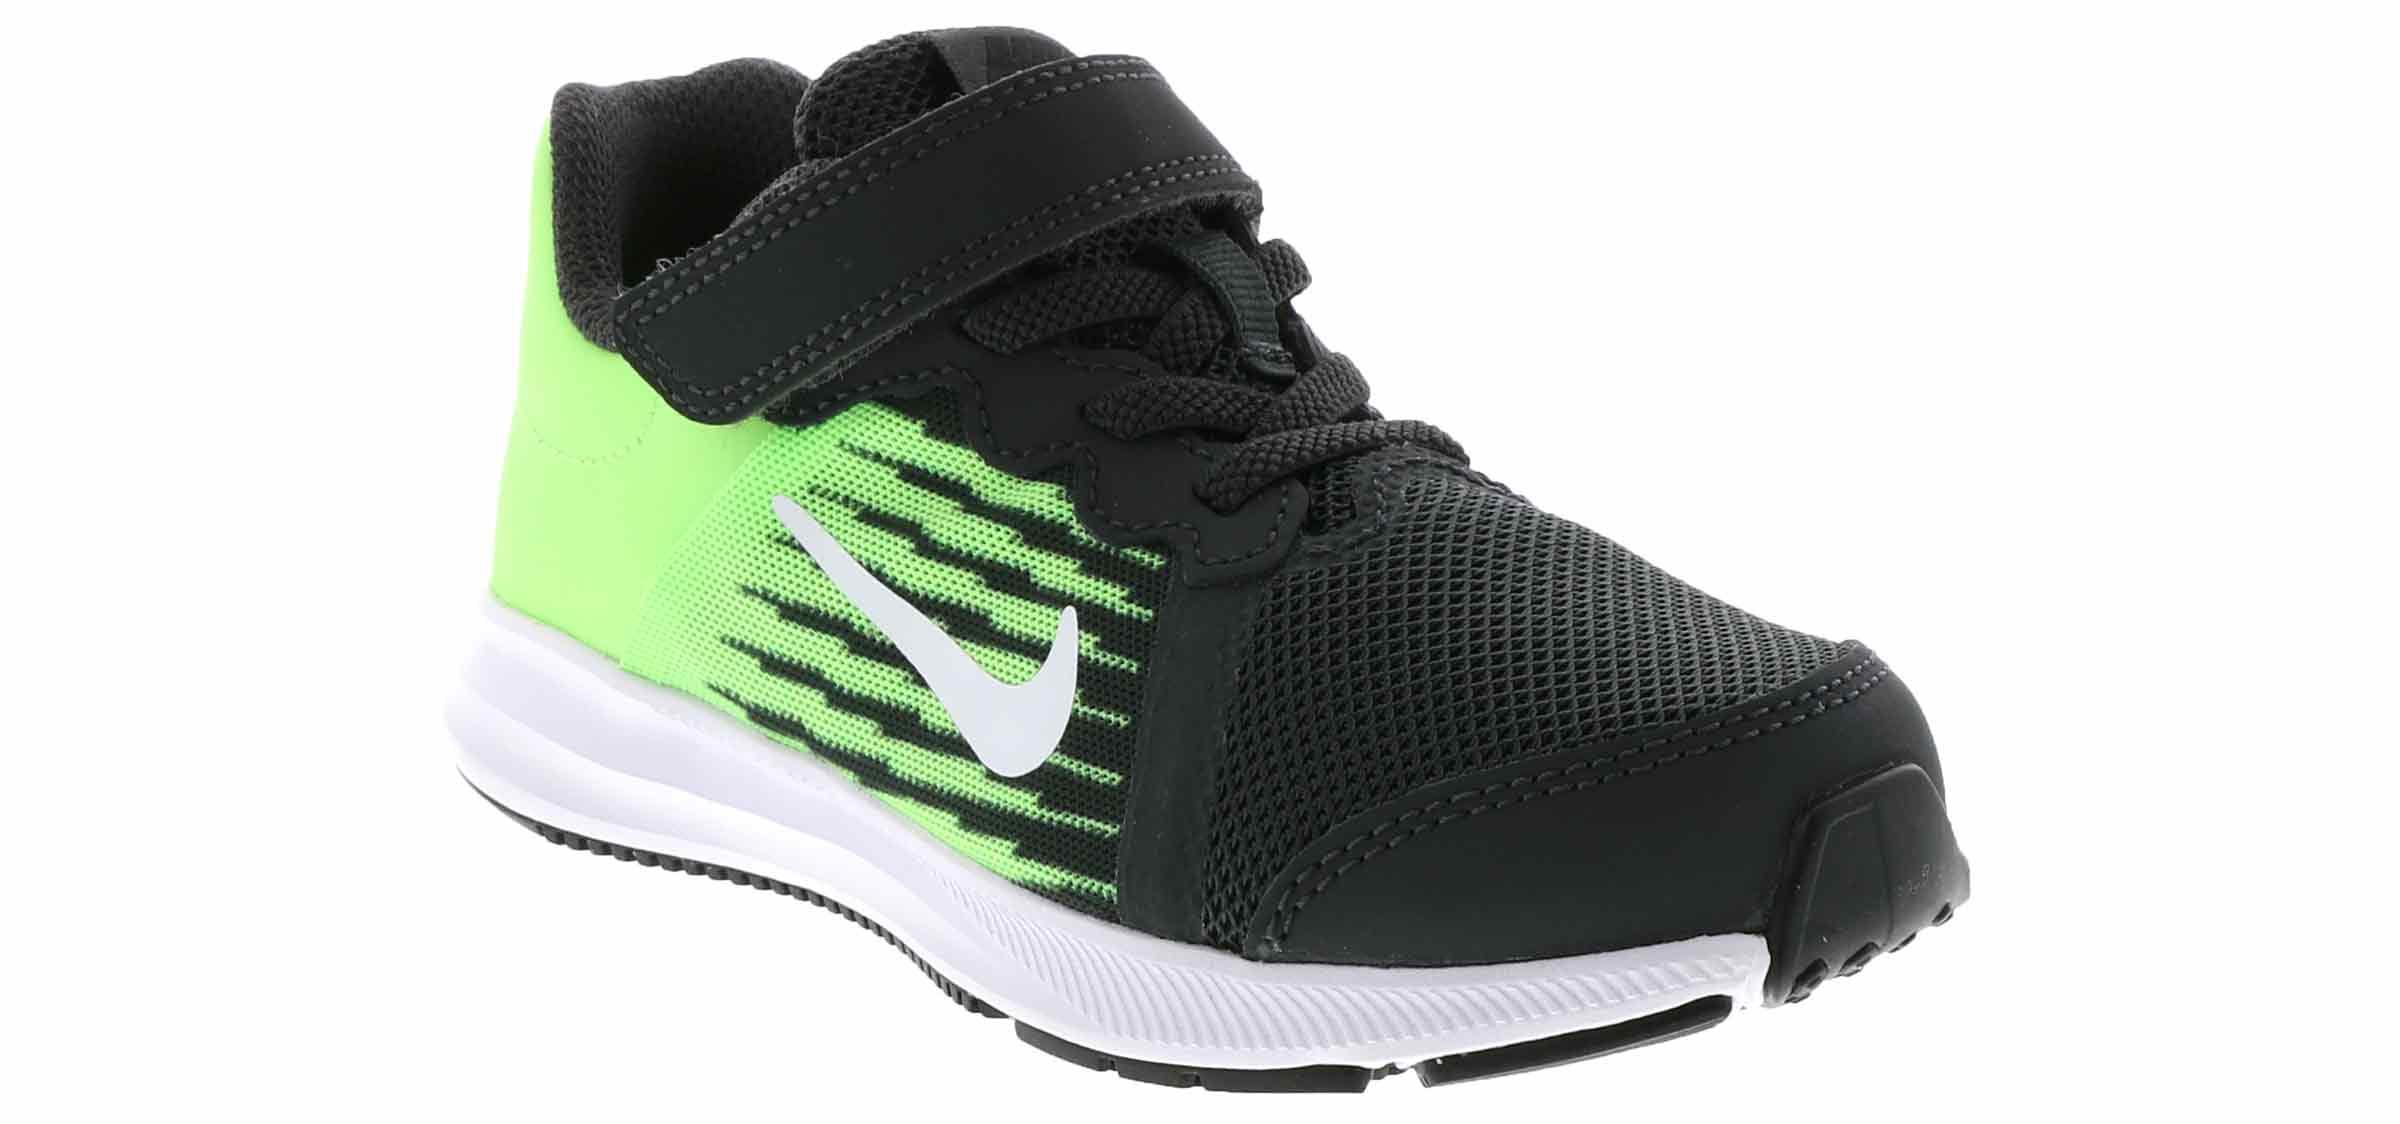 Kid's Nike Downshifter 8 Wide (11 3)